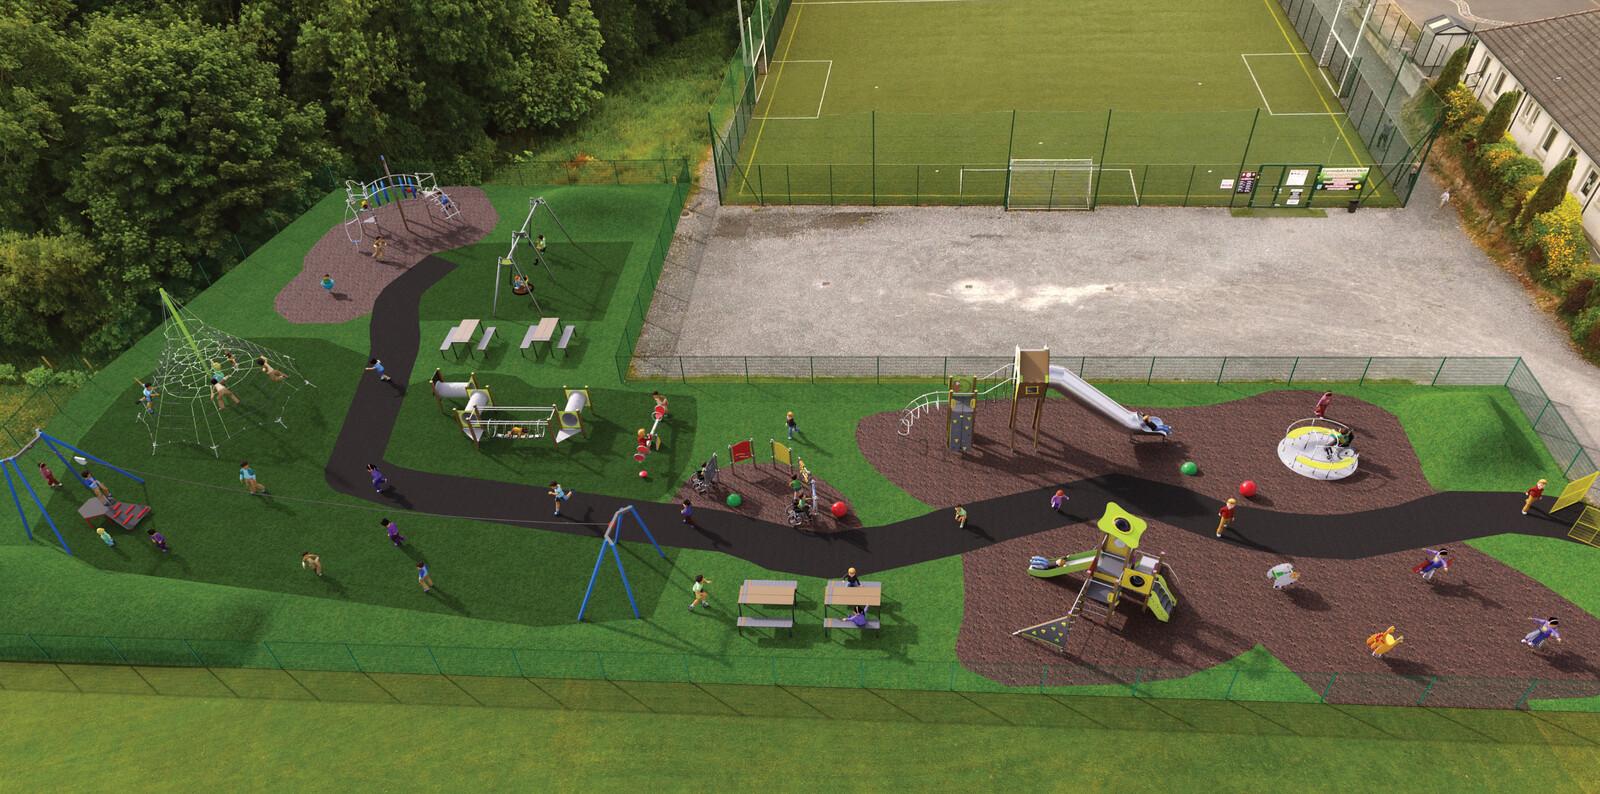 Playground montage view 4